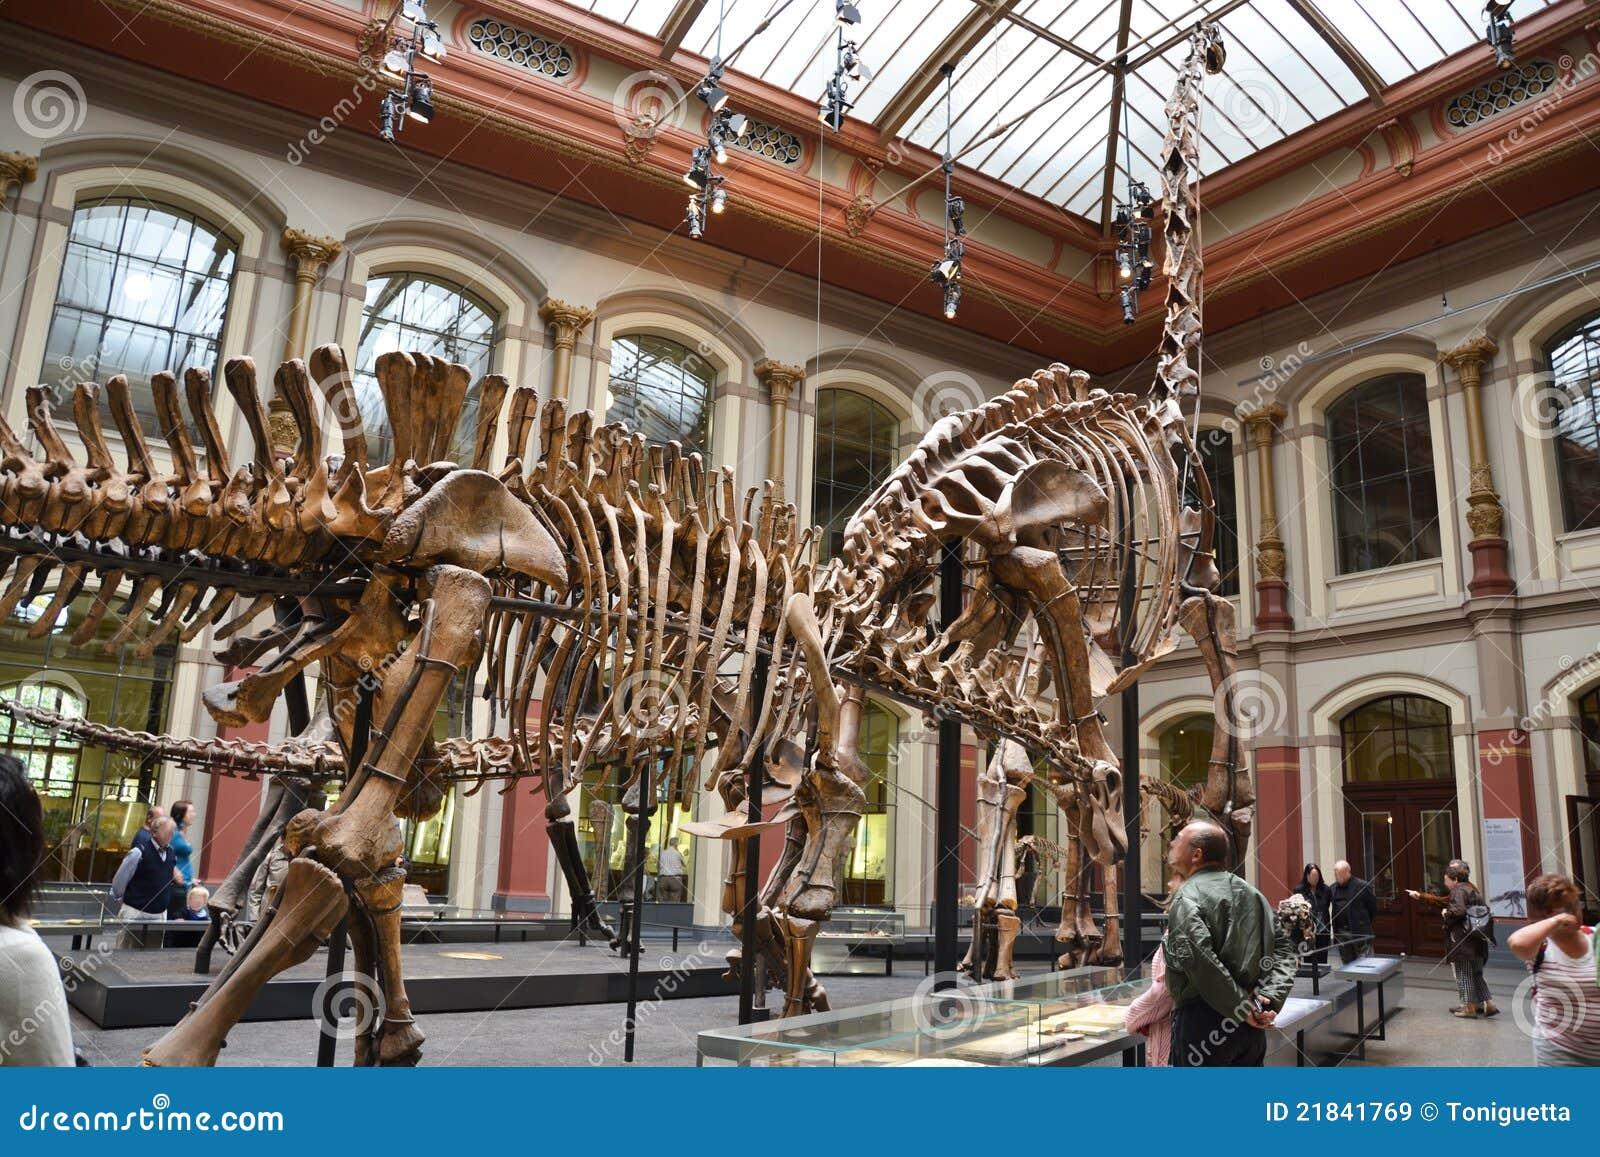 Berlin Natural History Museum Dinosaur